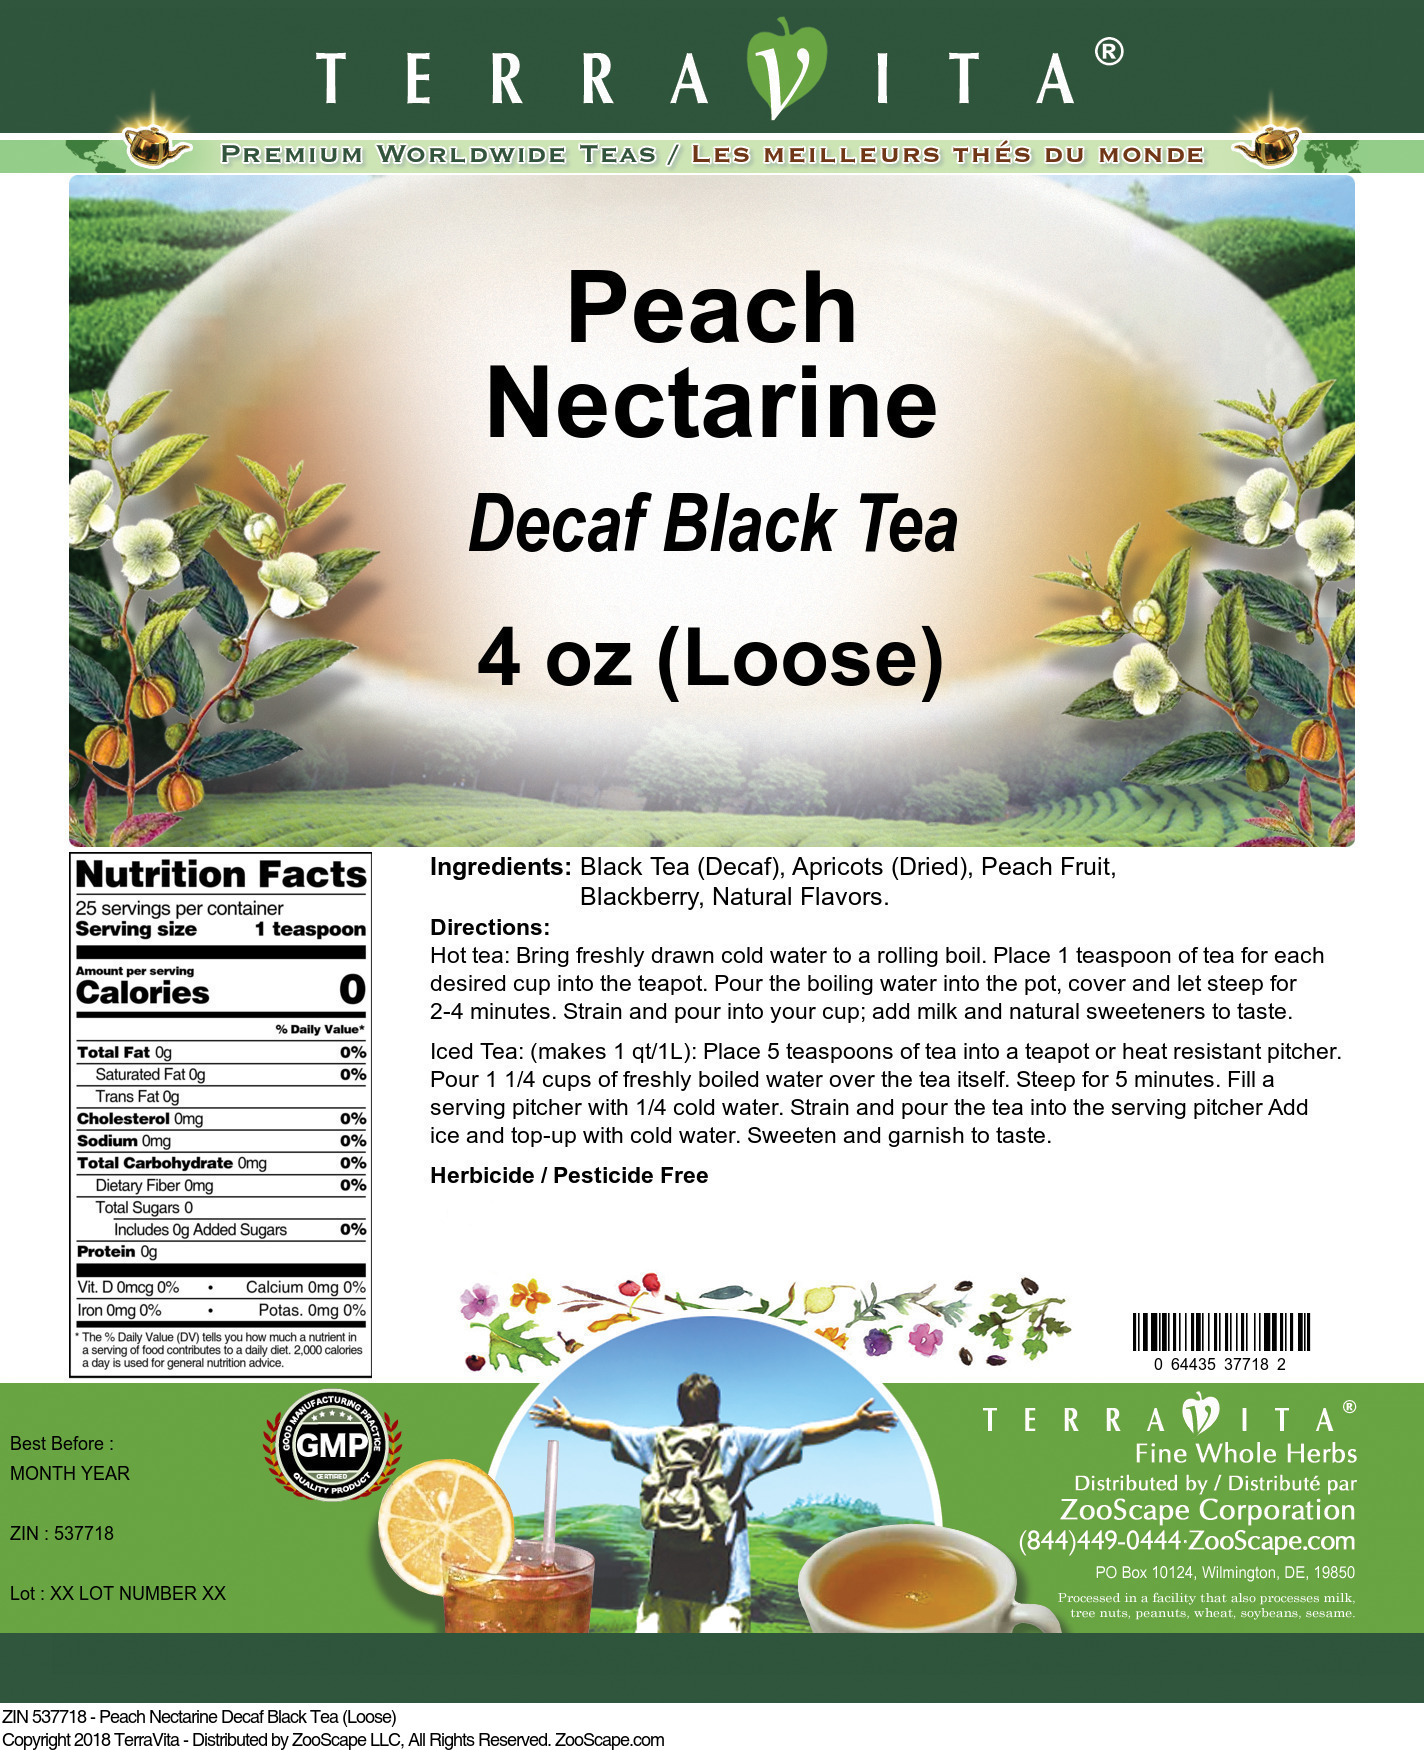 Peach Nectarine Decaf Black Tea (Loose)